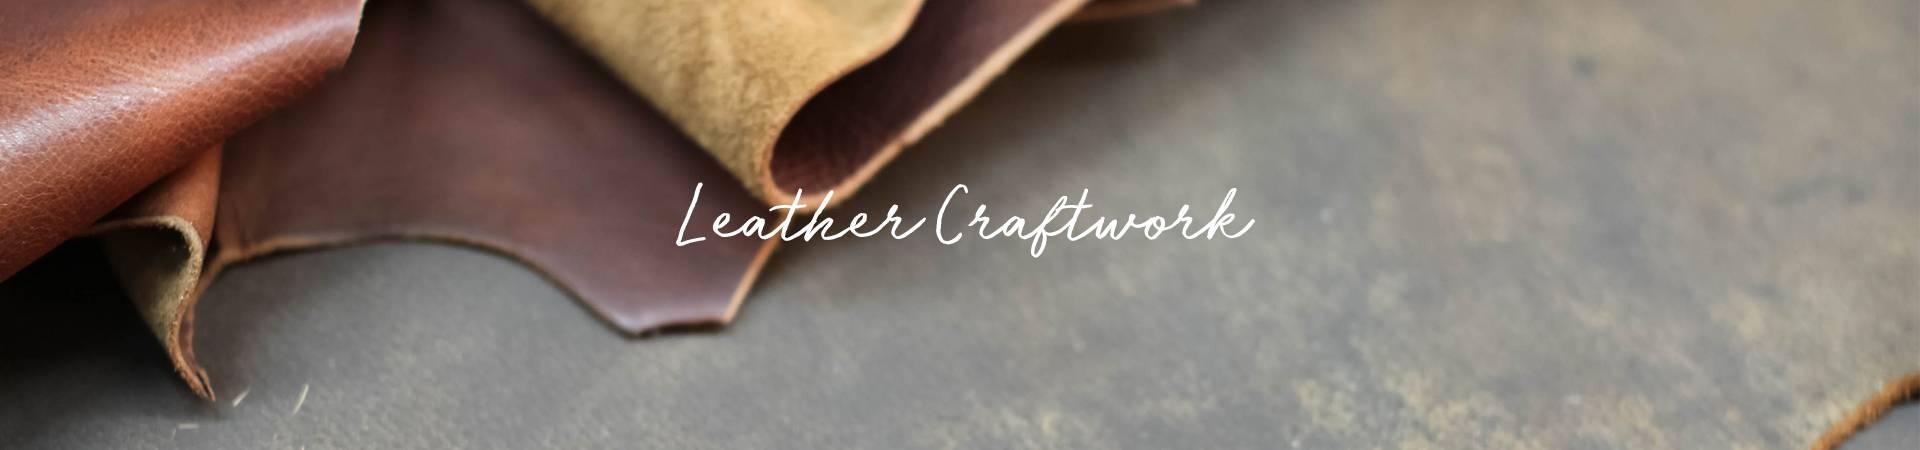 Nkuku_Leather-Craftwork_Header_Desktop.jpg